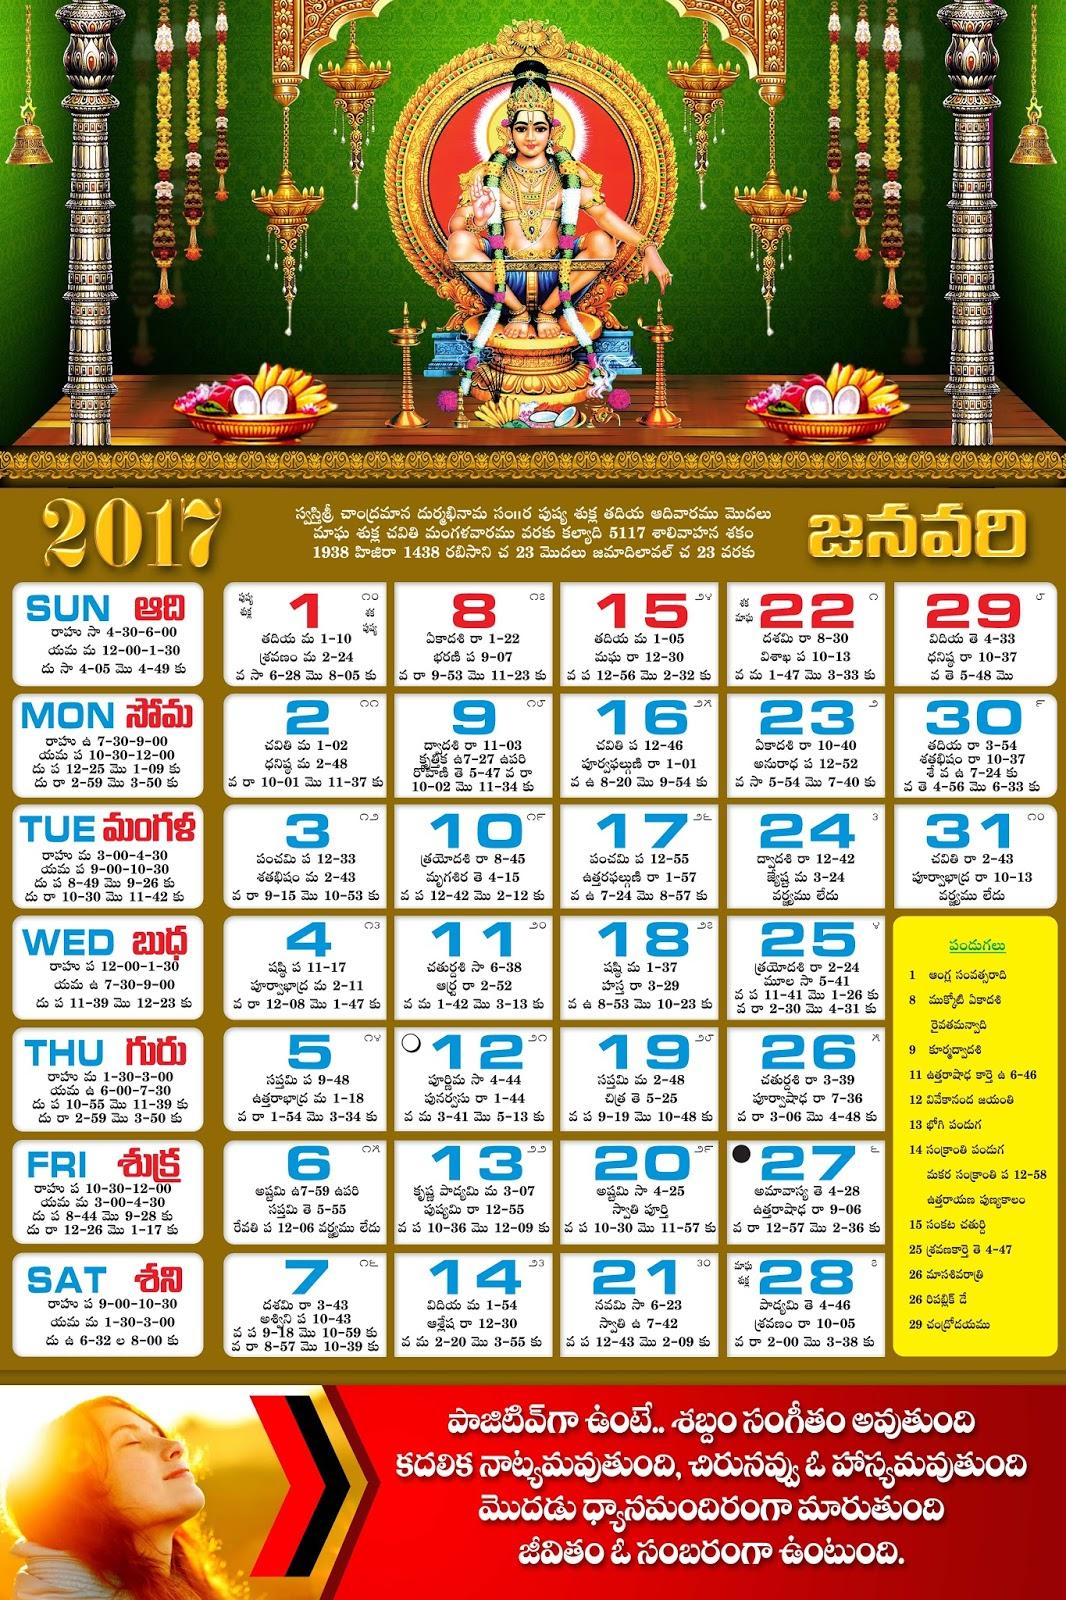 ... calendar kalnirnay february 2017 calendar february 2017 calendar